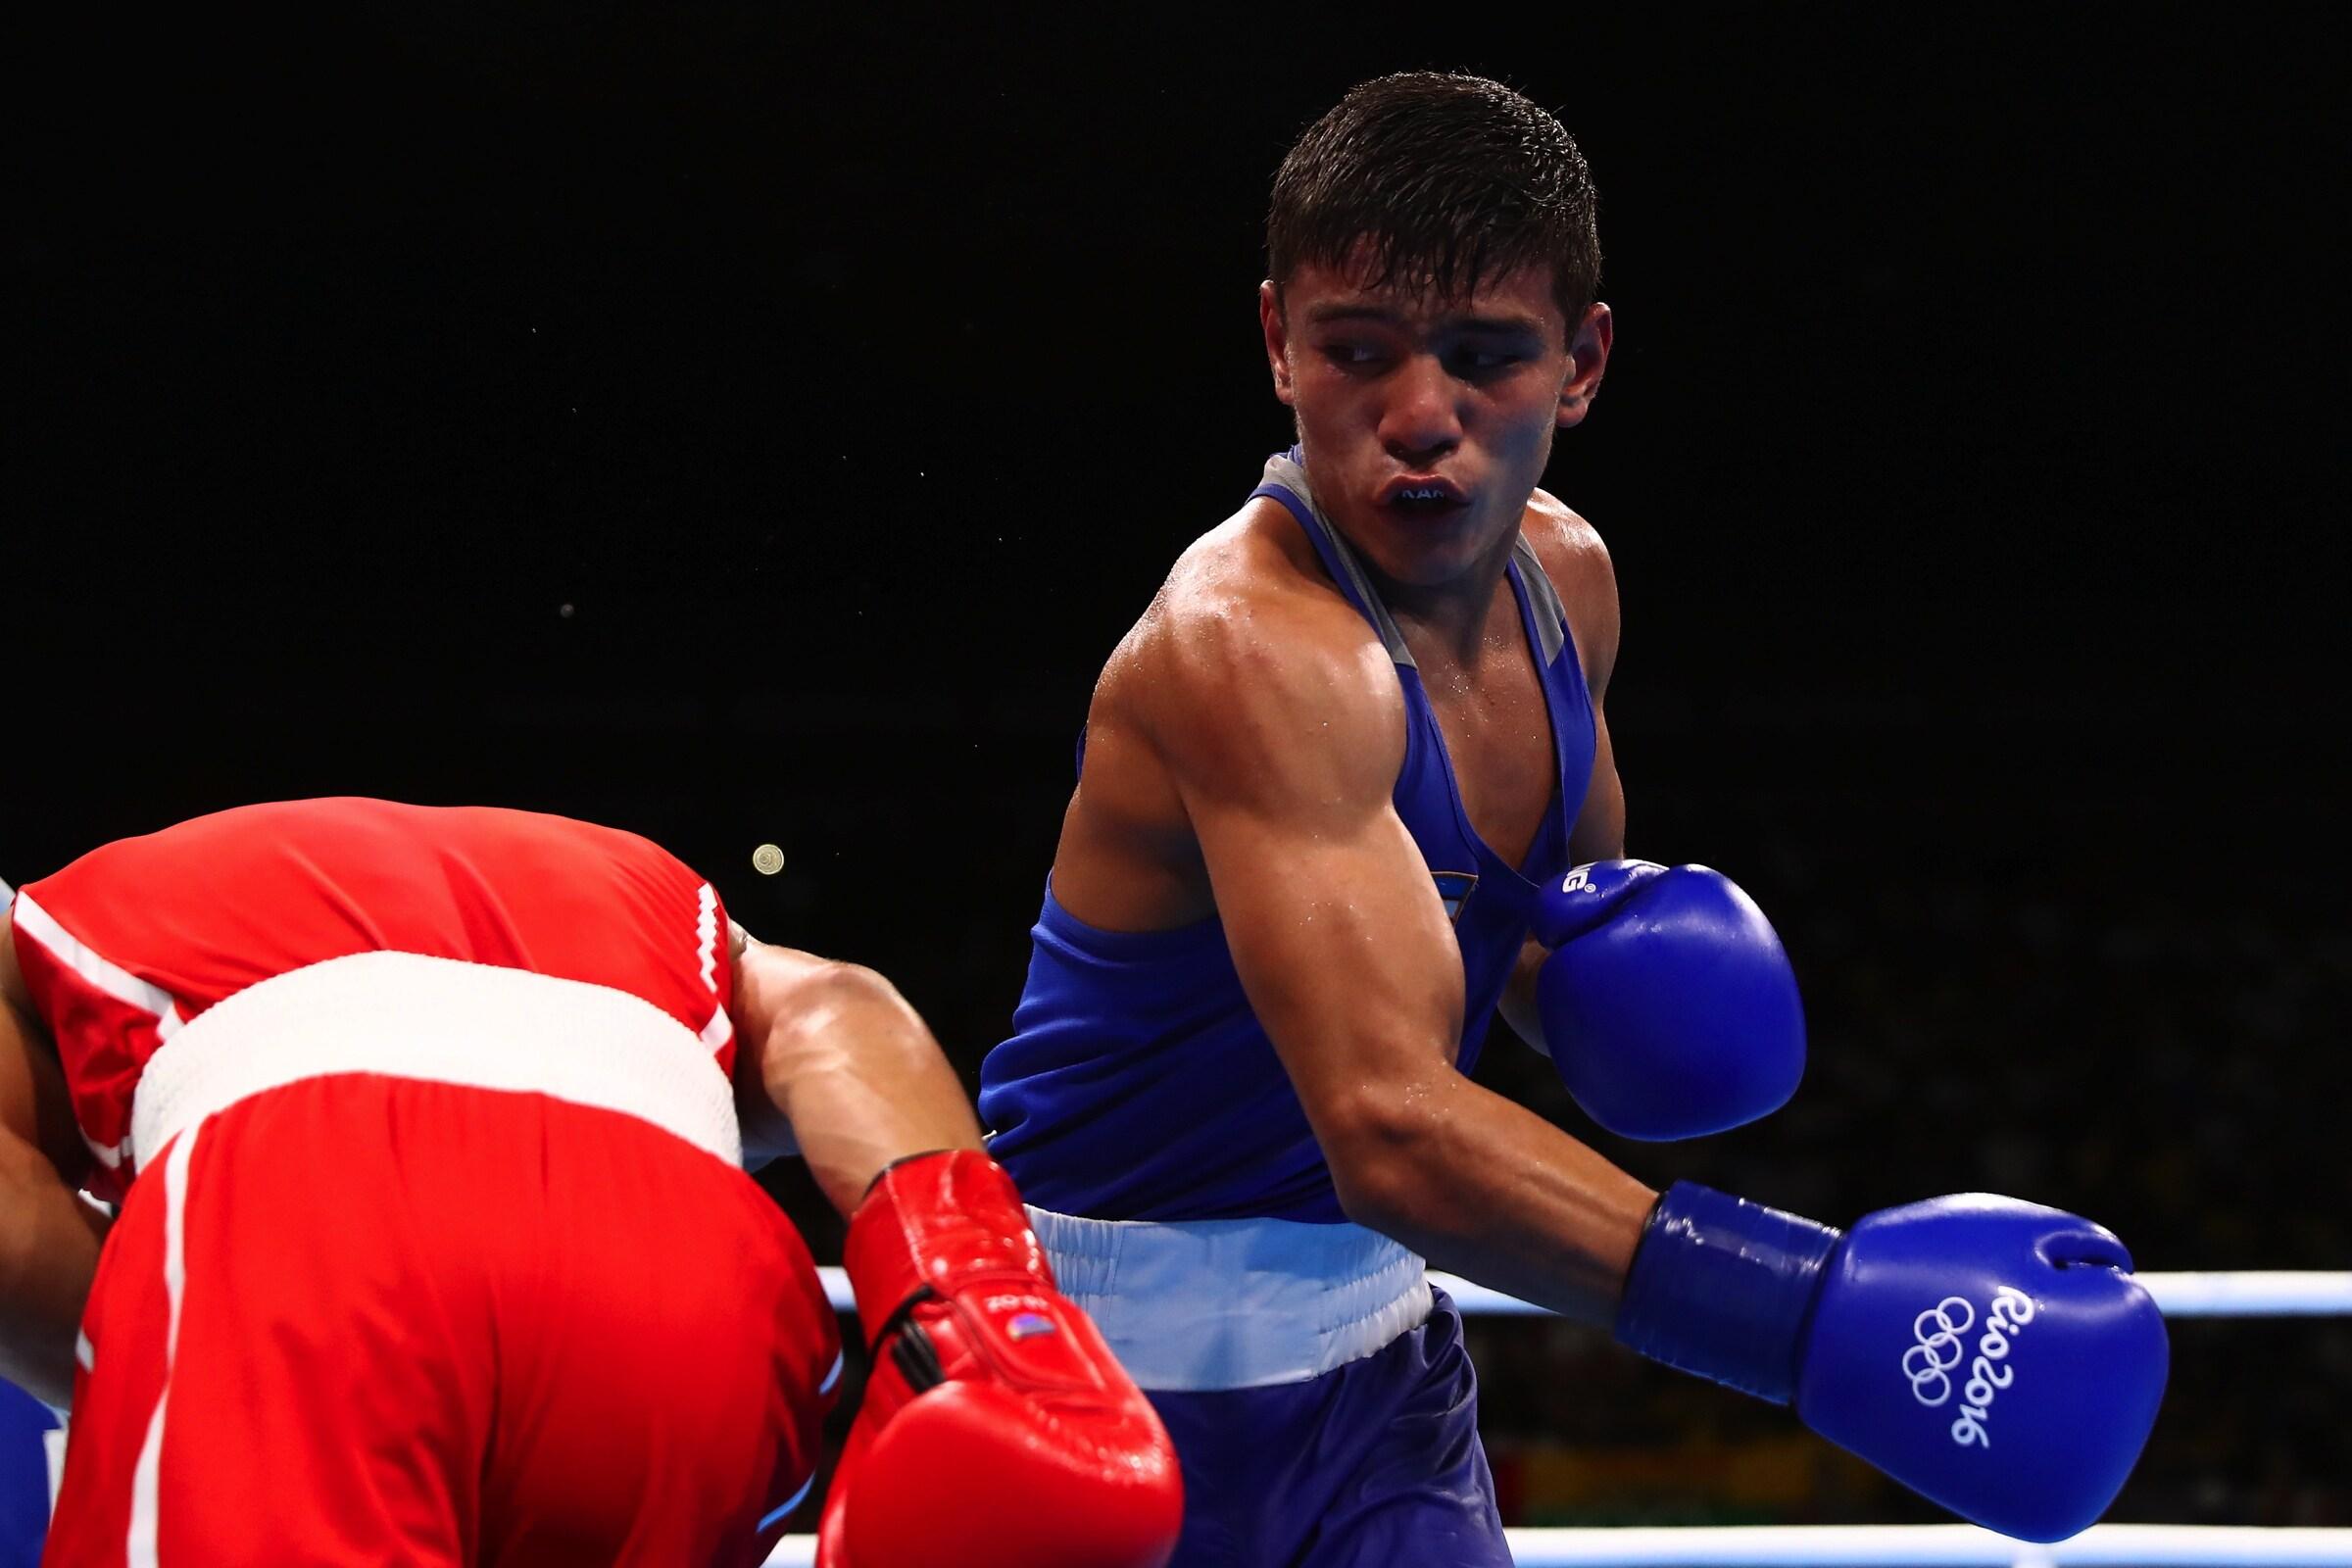 Boxing - Men's Bantam 56kg